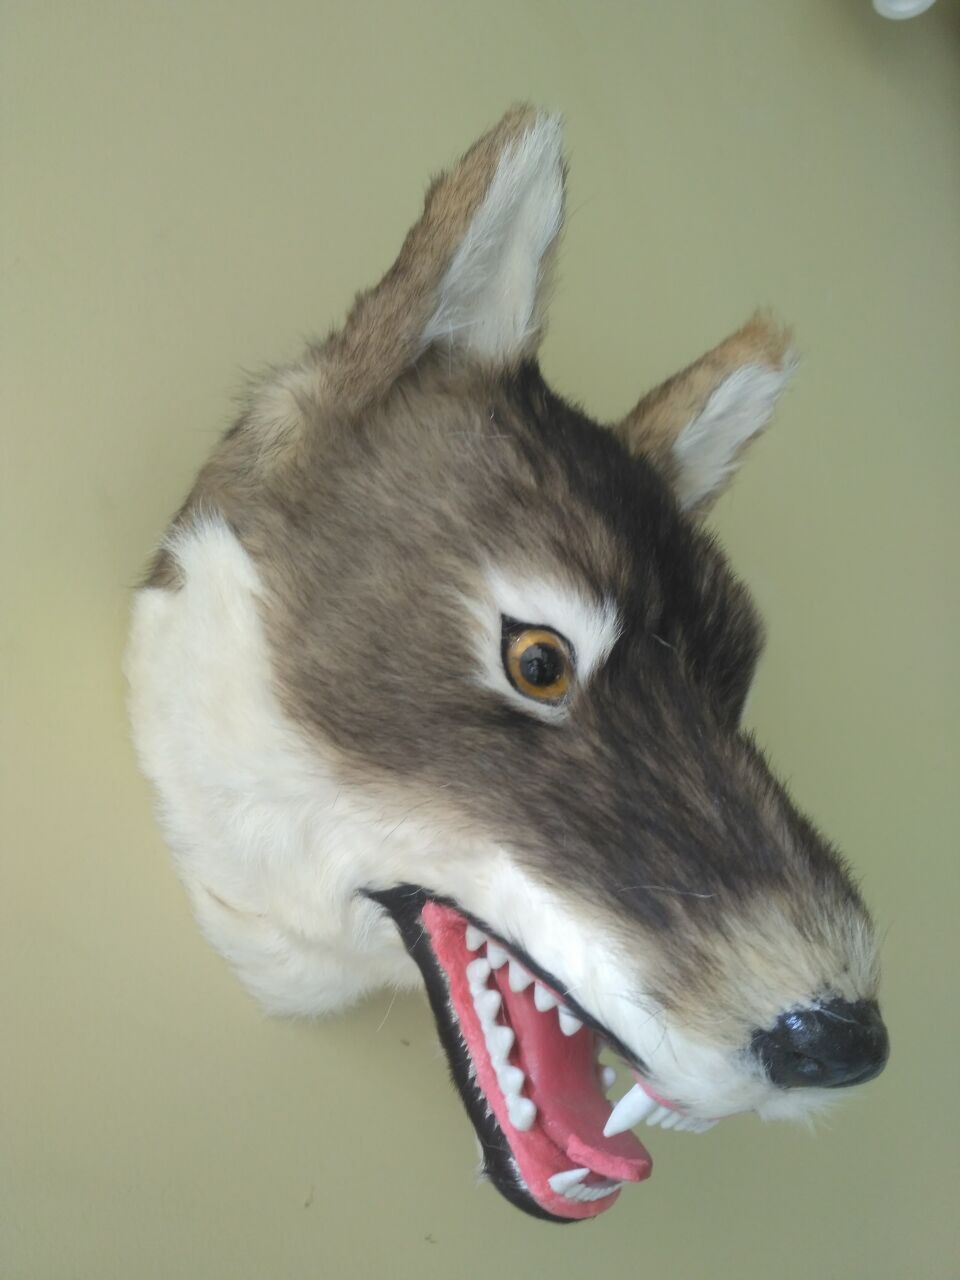 big new simulation wolf head model polyethylene&furs wolf 's head model 30x23x25cm 1603 big sitting simulation white cat model plastic